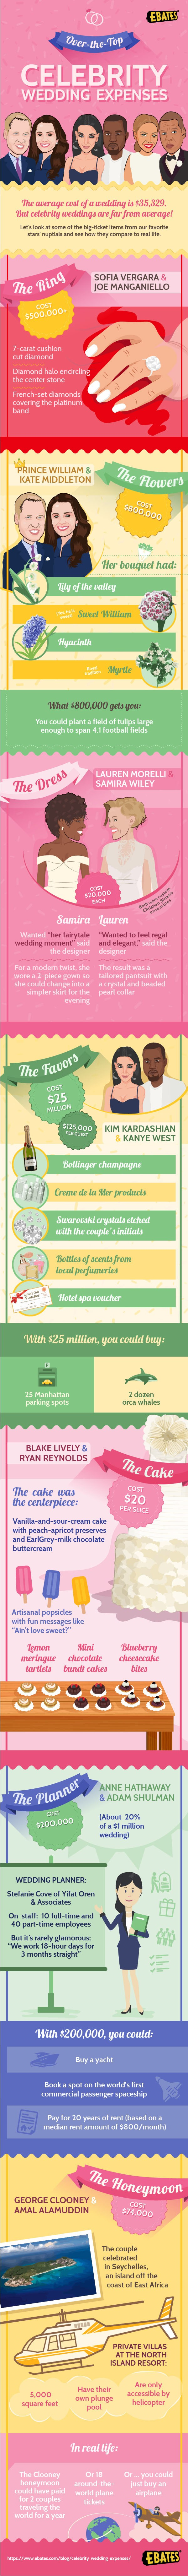 Big-ticket, Big-Expense Celebrity Weddings - Infographic